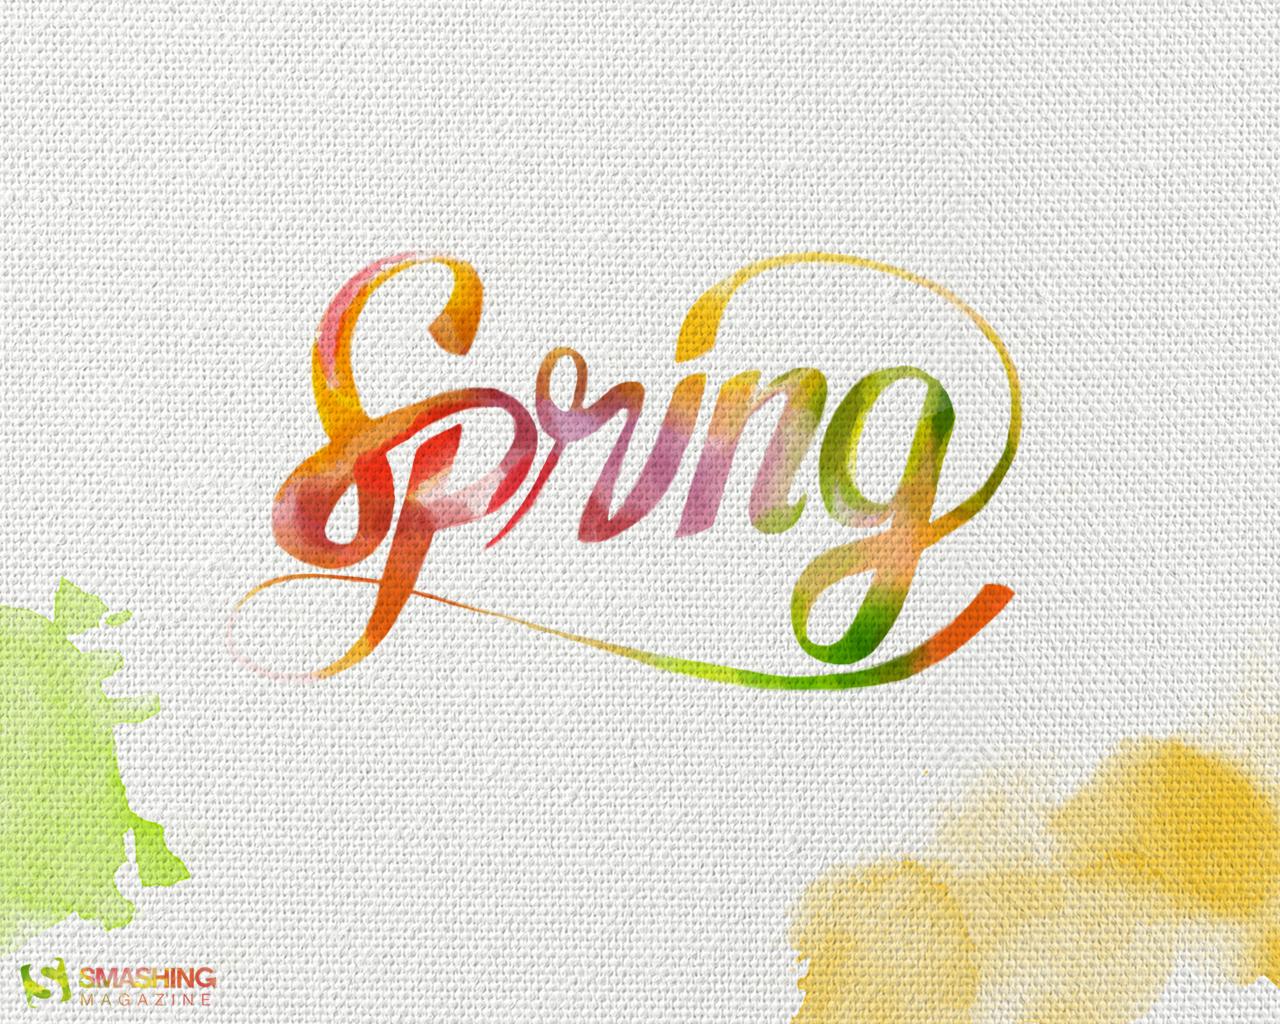 Virtual Calendar Wallpaper : Desktop wallpaper calendars april — smashing magazine